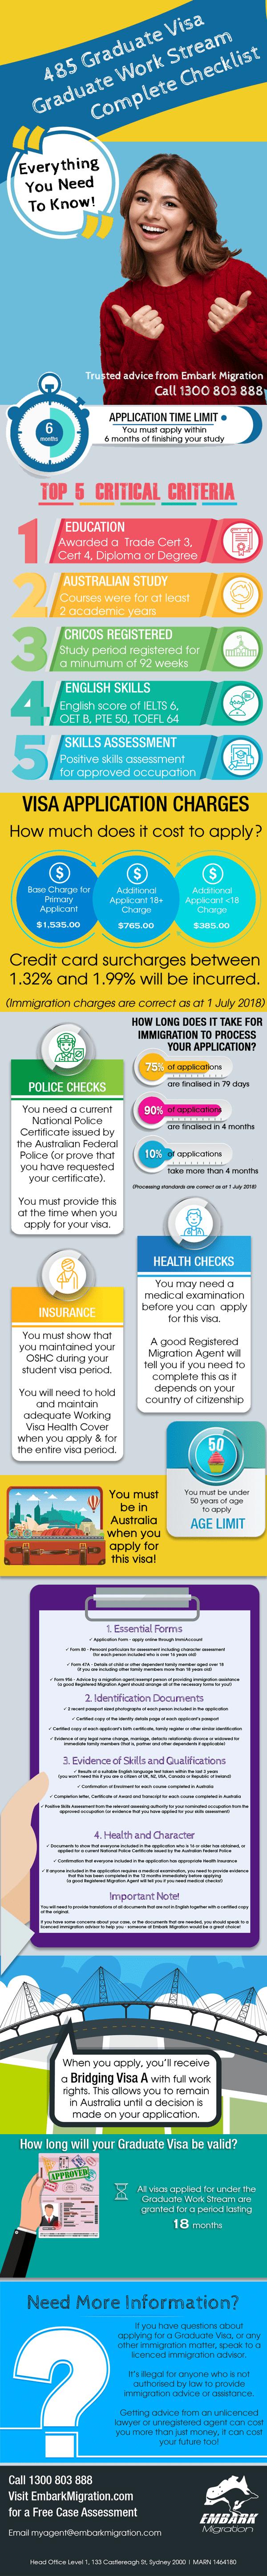 Complete 485 Visa Checklist for the Graduate Work Stream